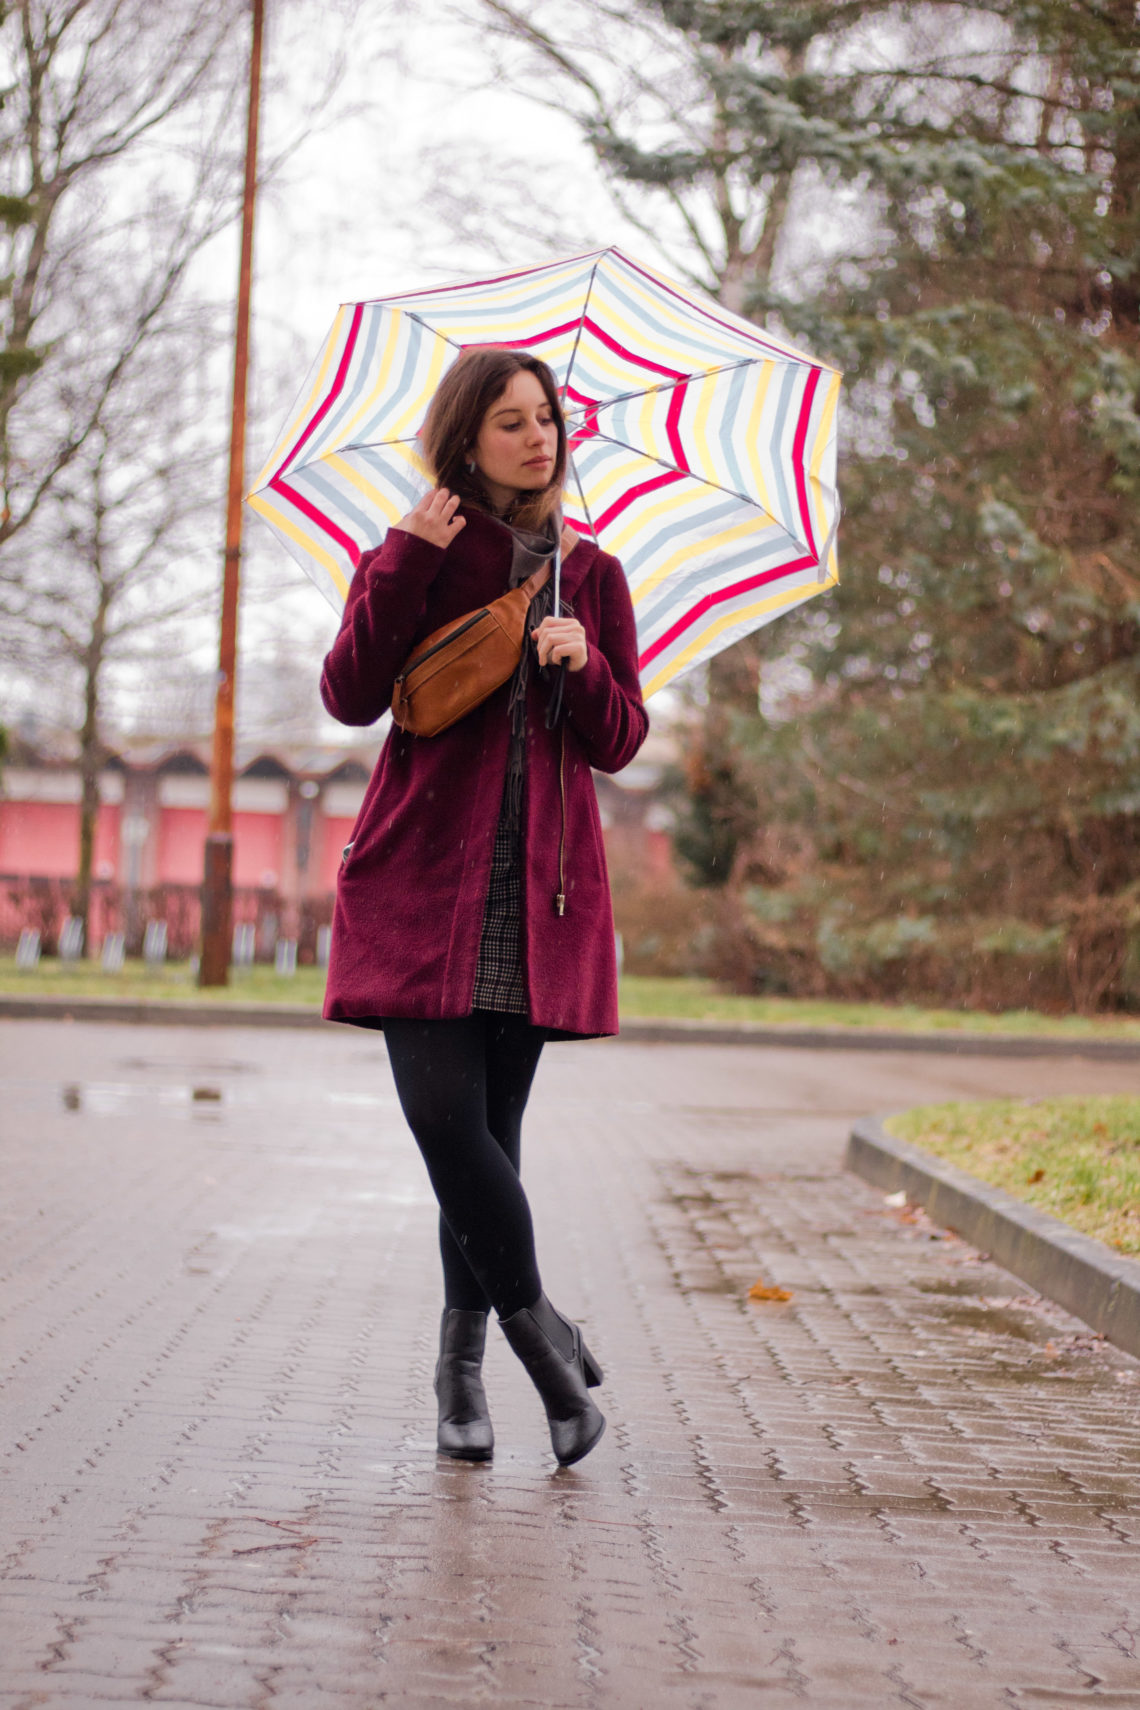 Schlecht-Wetter-Outfit für den Frühling